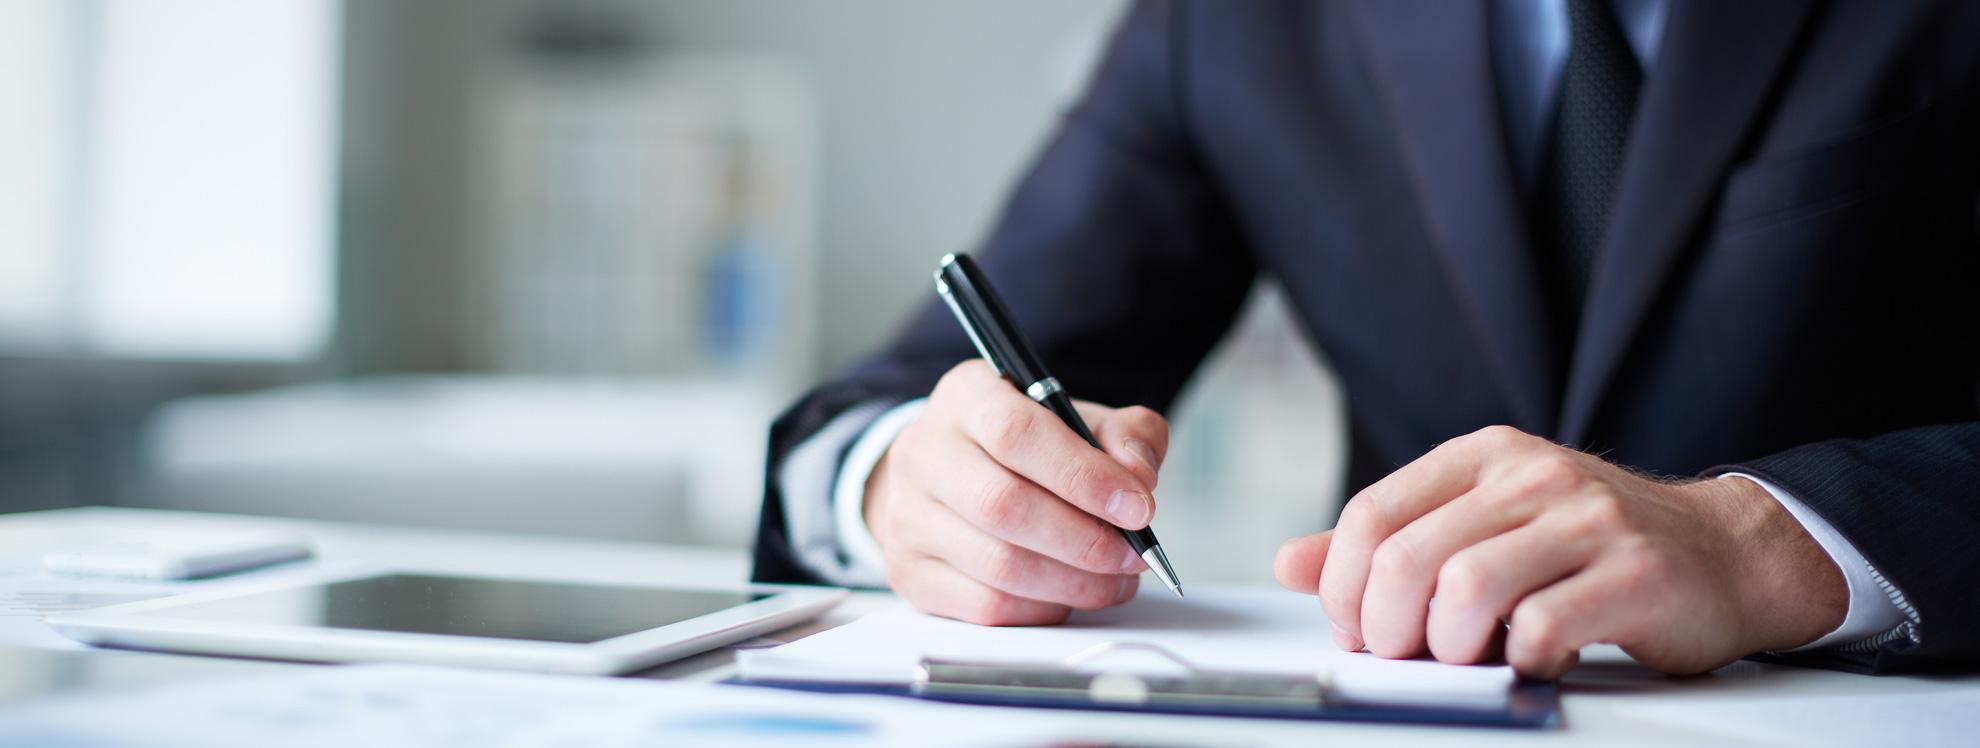 Срочное кредит на исполнение контракта кредитная карта девон кредит